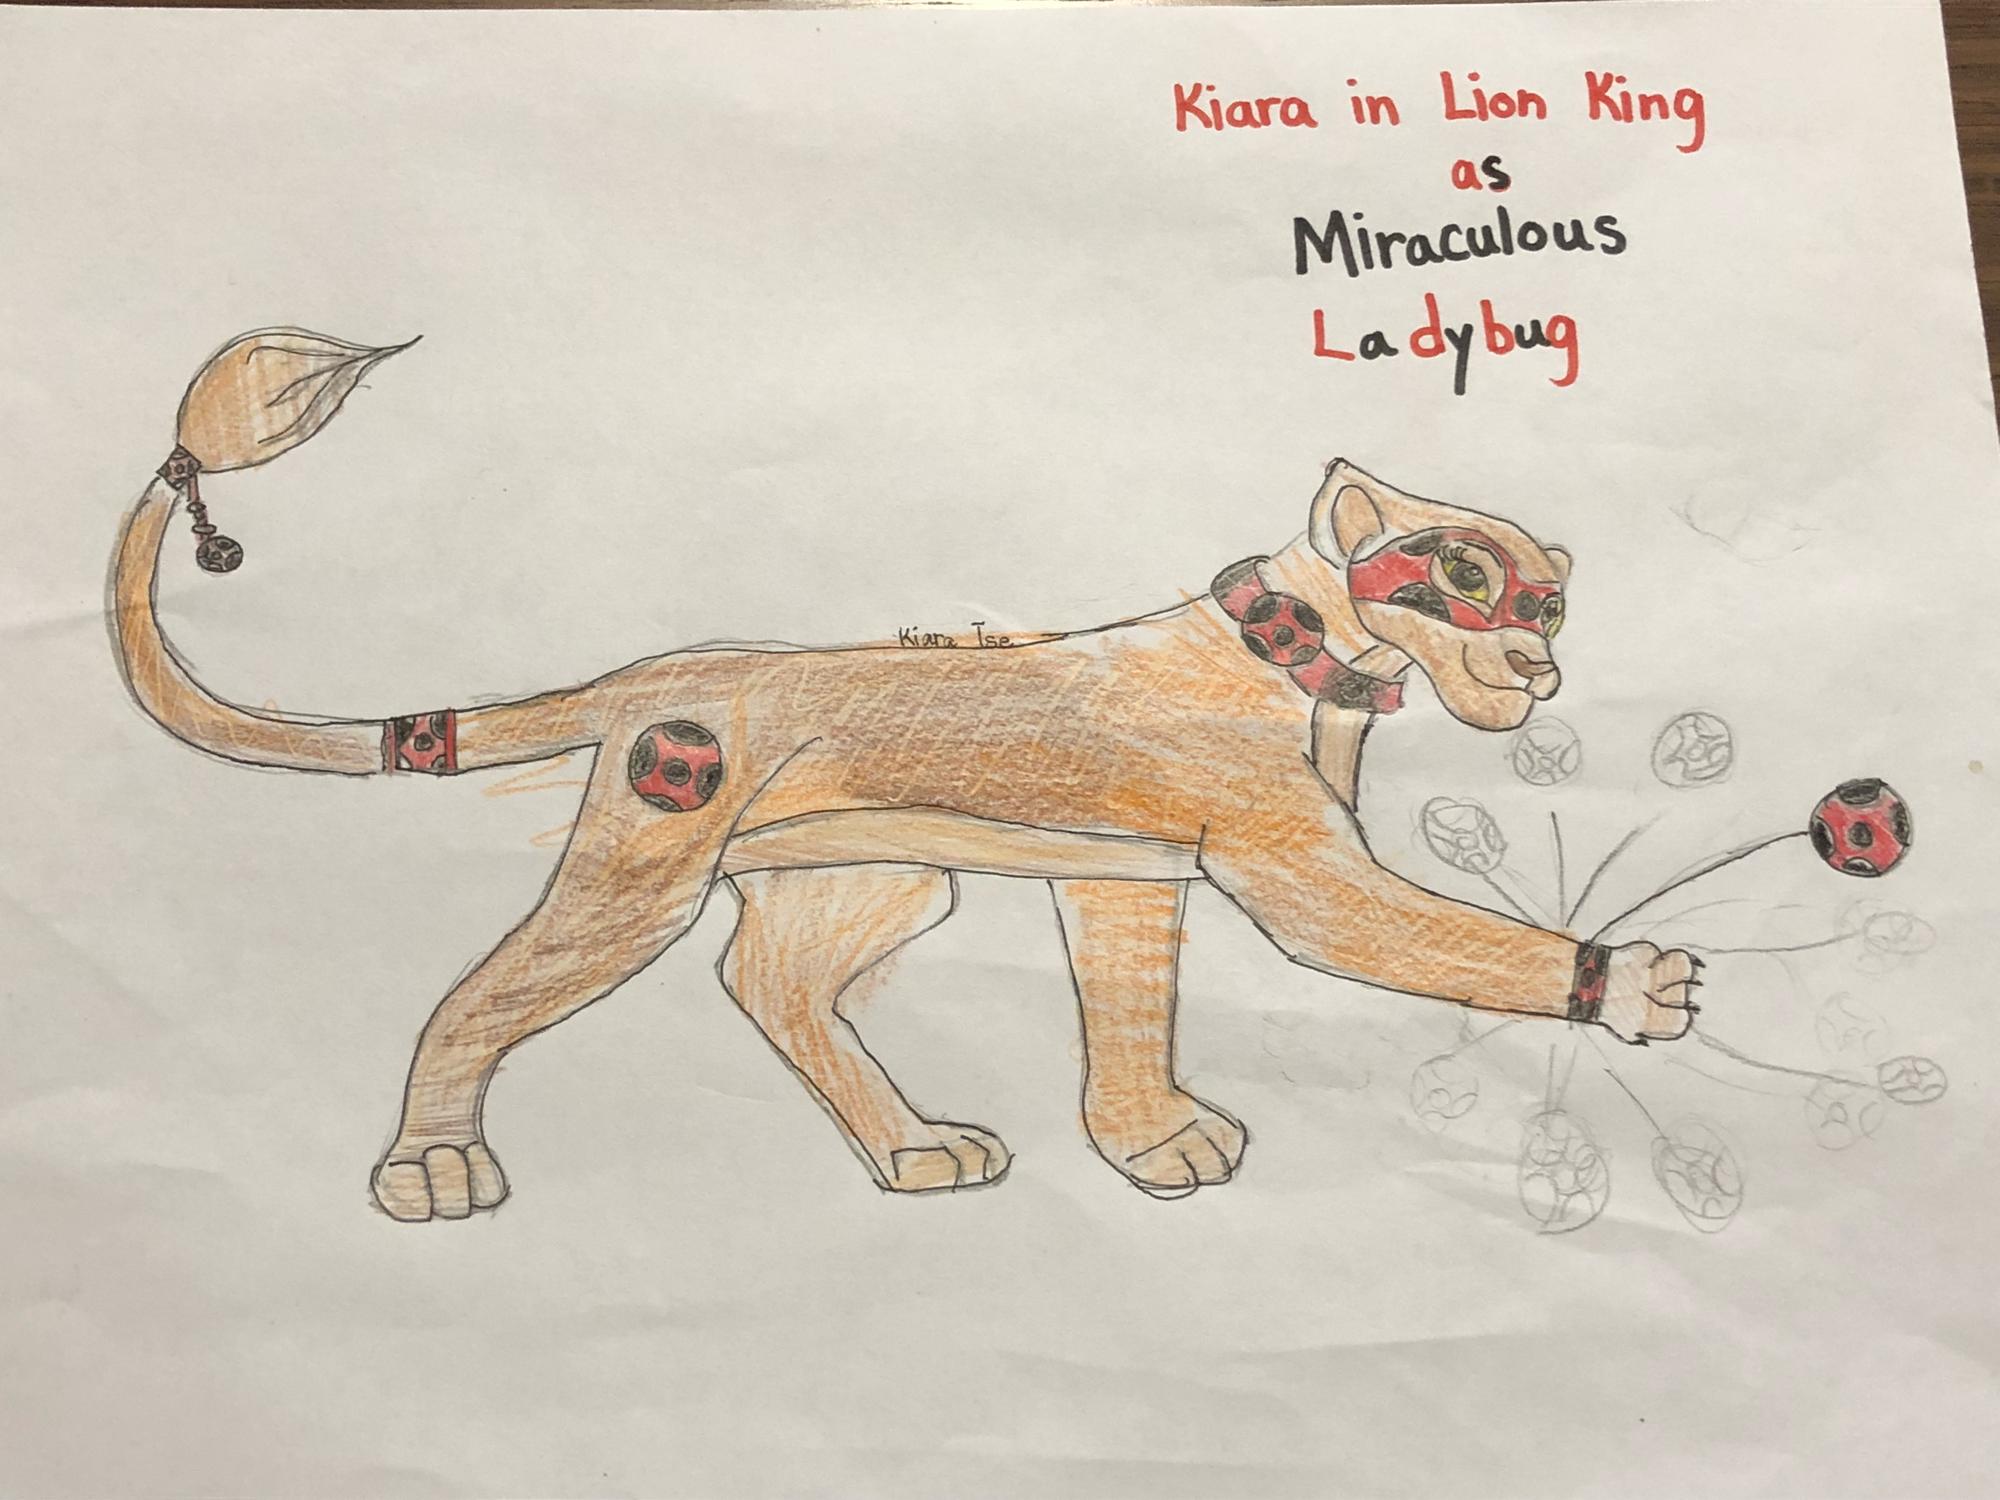 I drew Kiara in lion king as ladybug